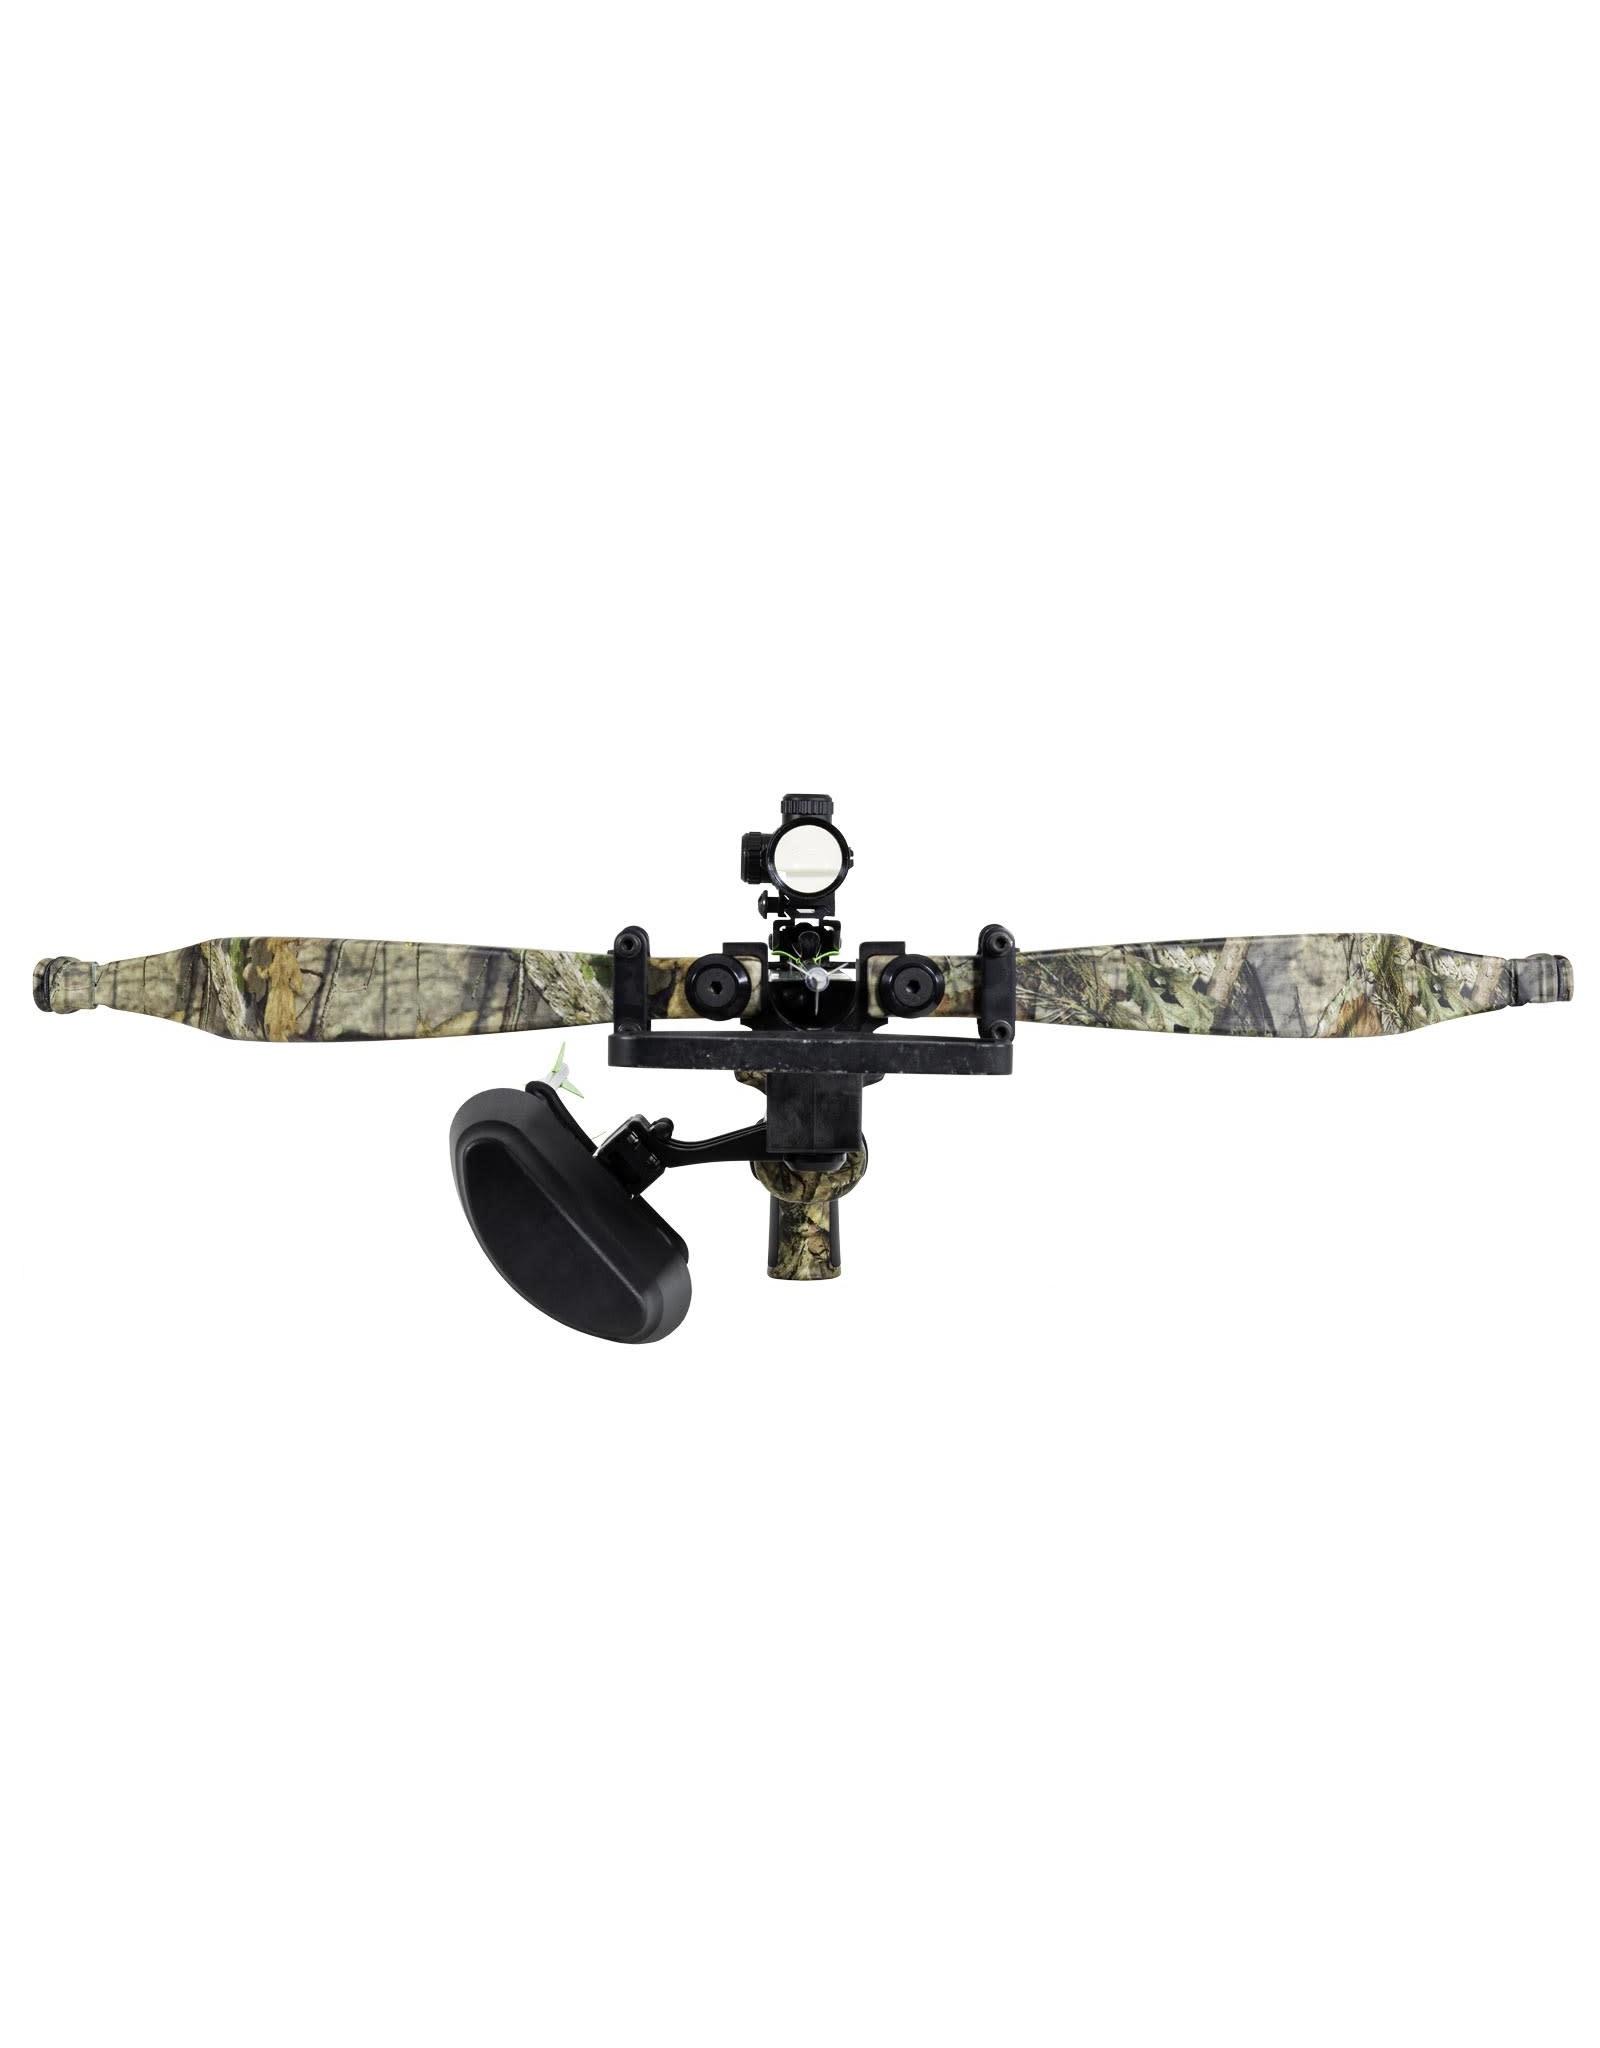 Excalibur Crossbows EXCALIBUR G340 CROSSBOW PKG #E73392